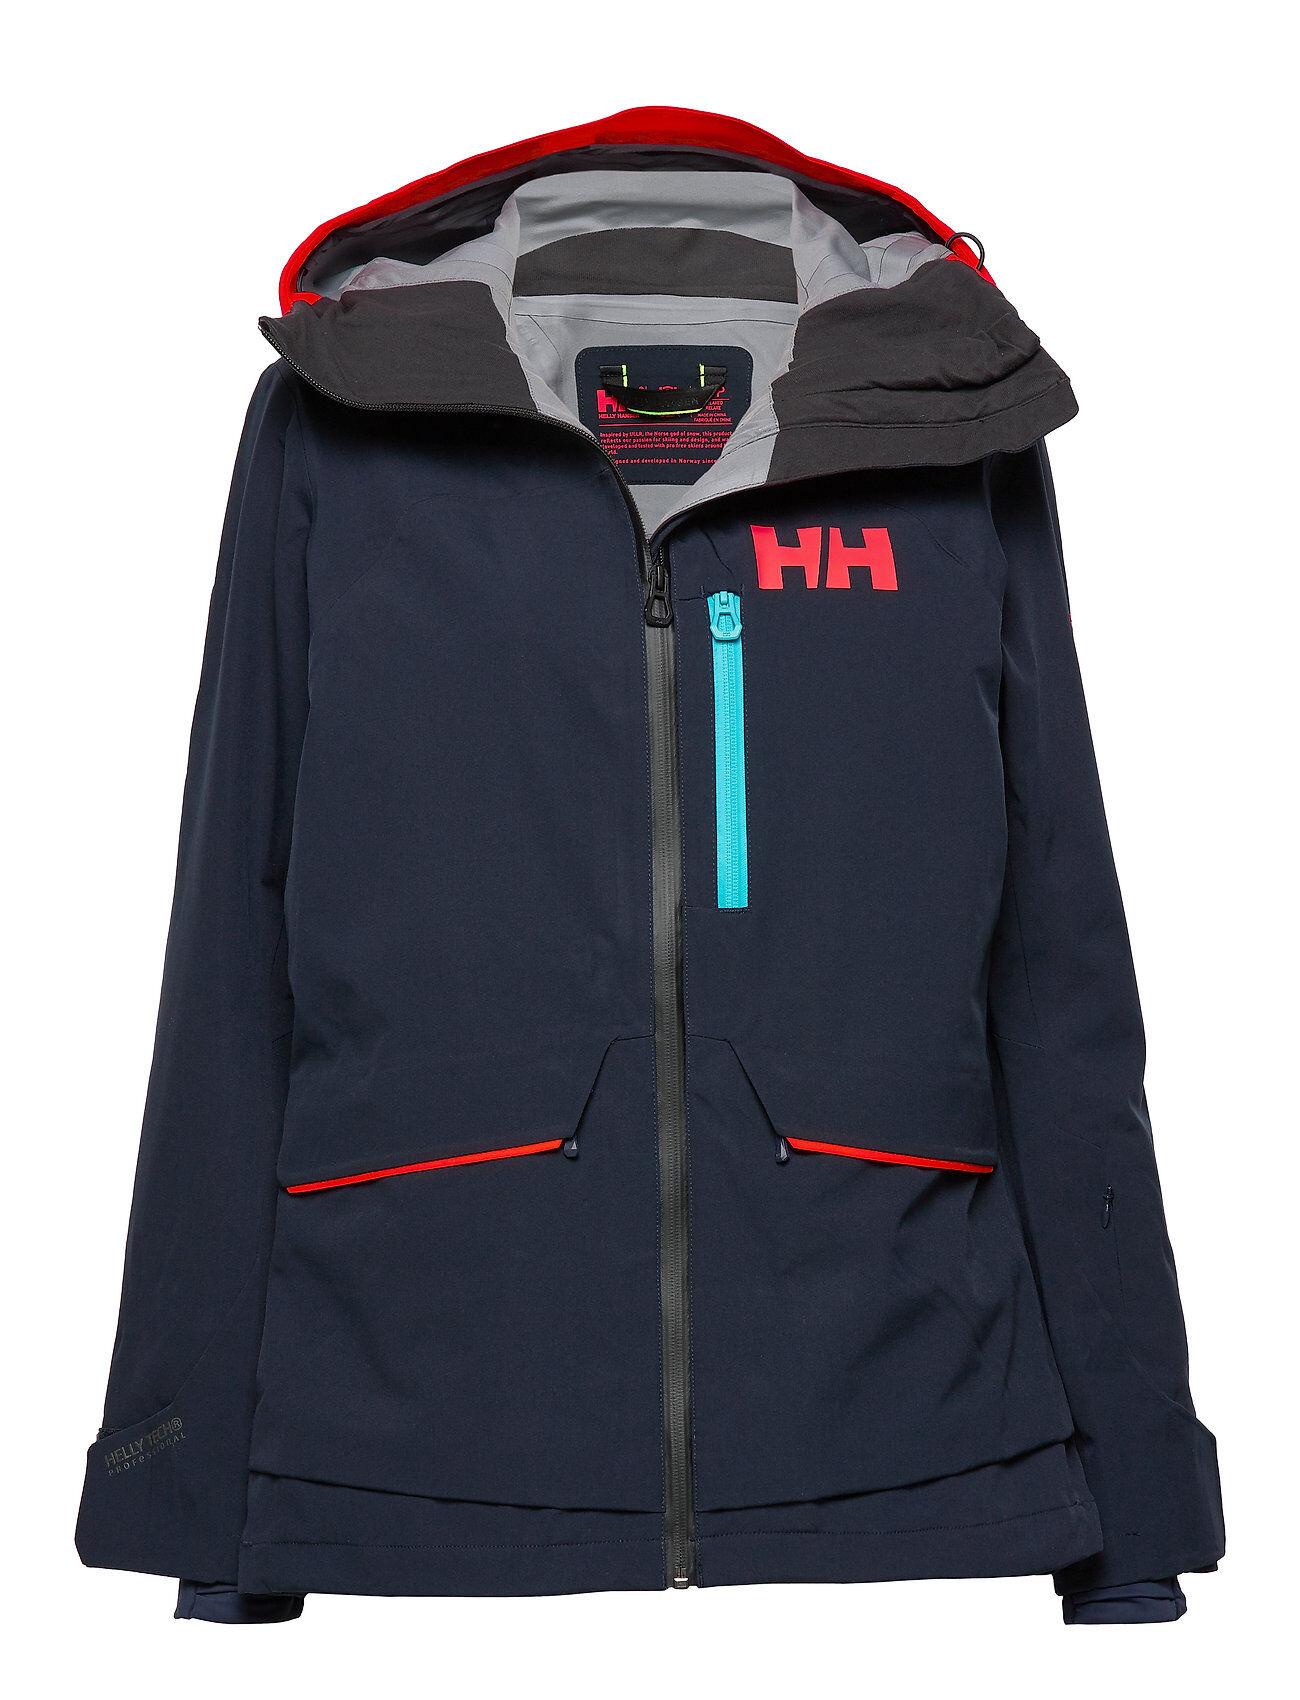 Image of Helly Hansen W Aurora Shell 2.0 Jacket Outerwear Sport Jackets Sininen Helly Hansen